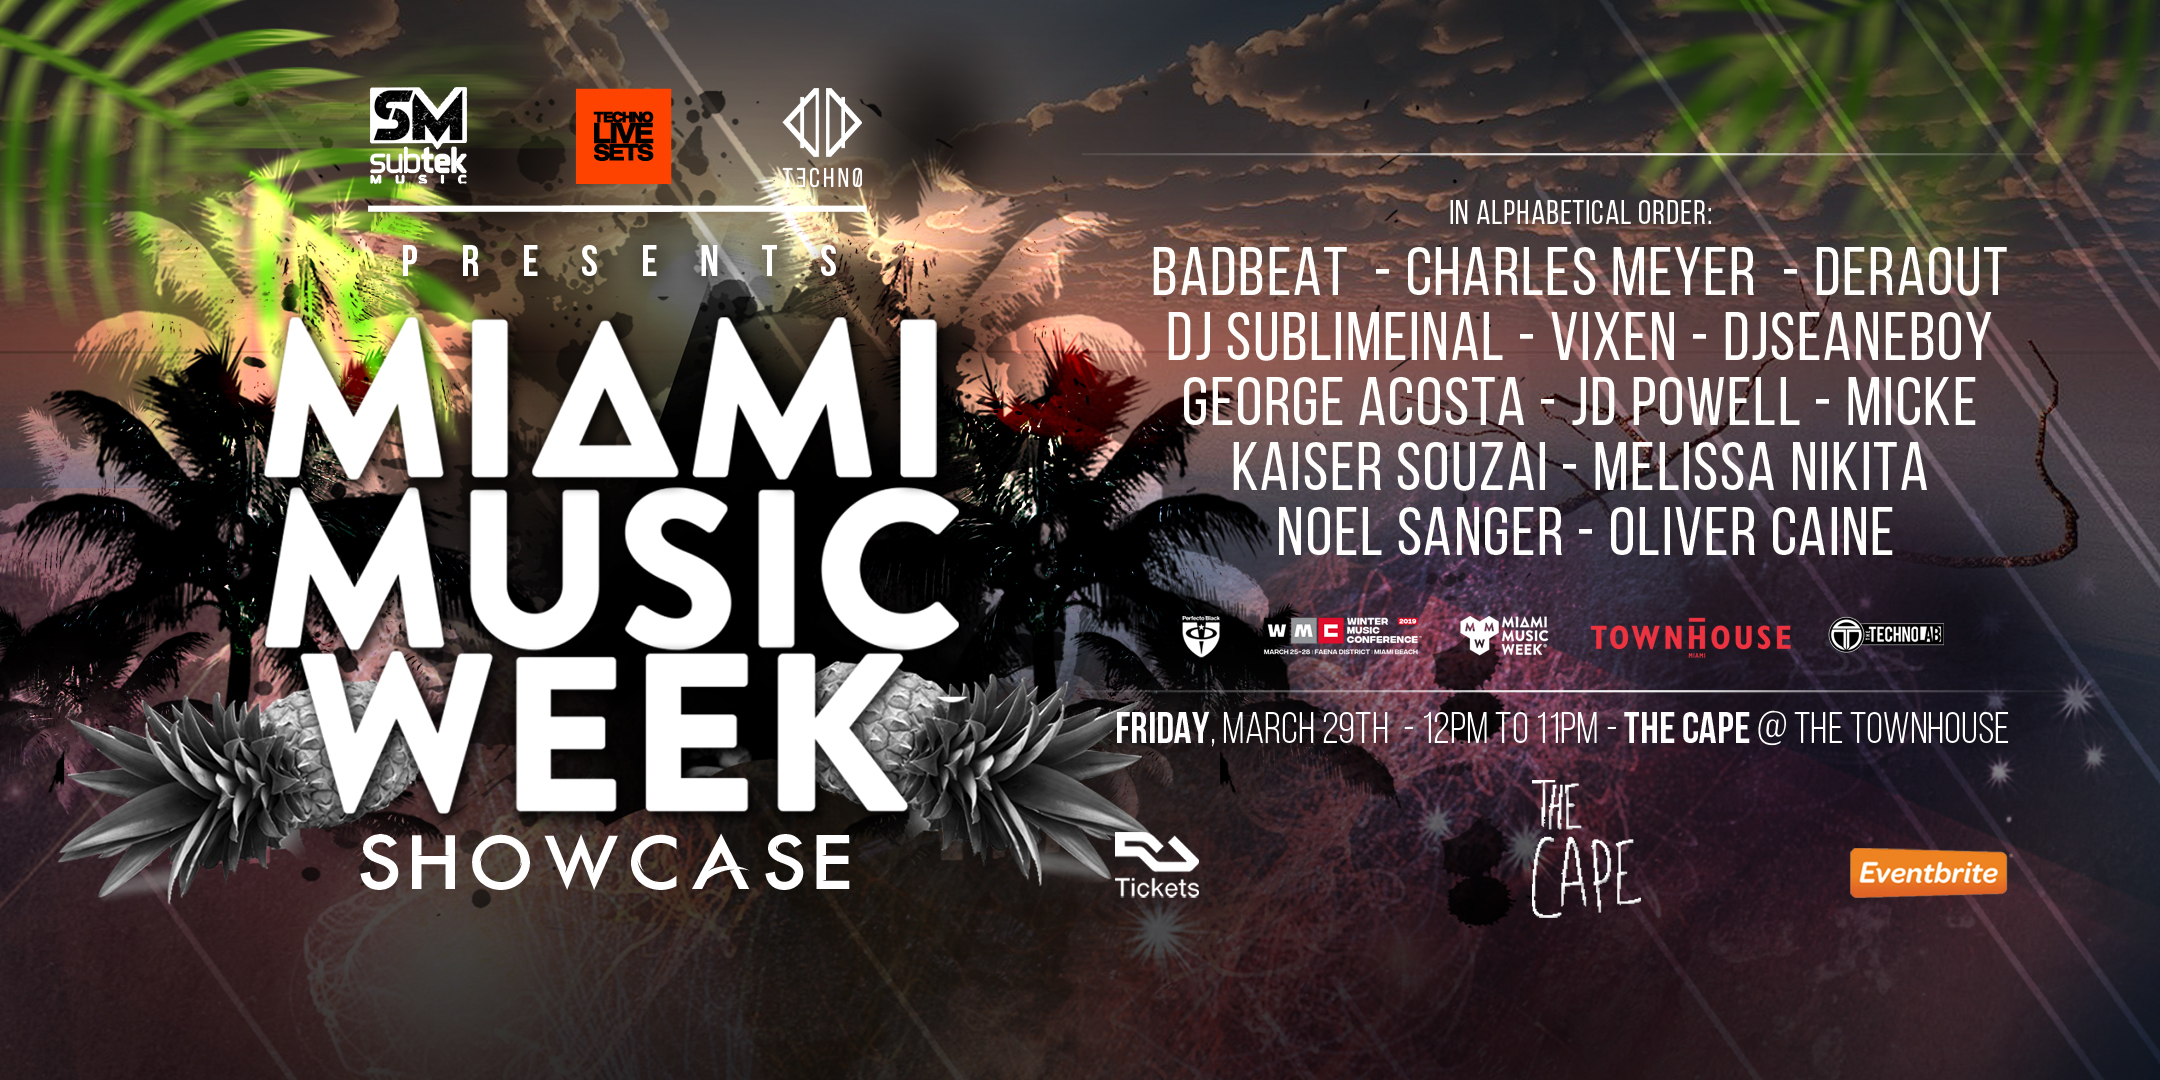 Techno Live Sets, Subtek Music Presents: Miami Music Week Showcase Image